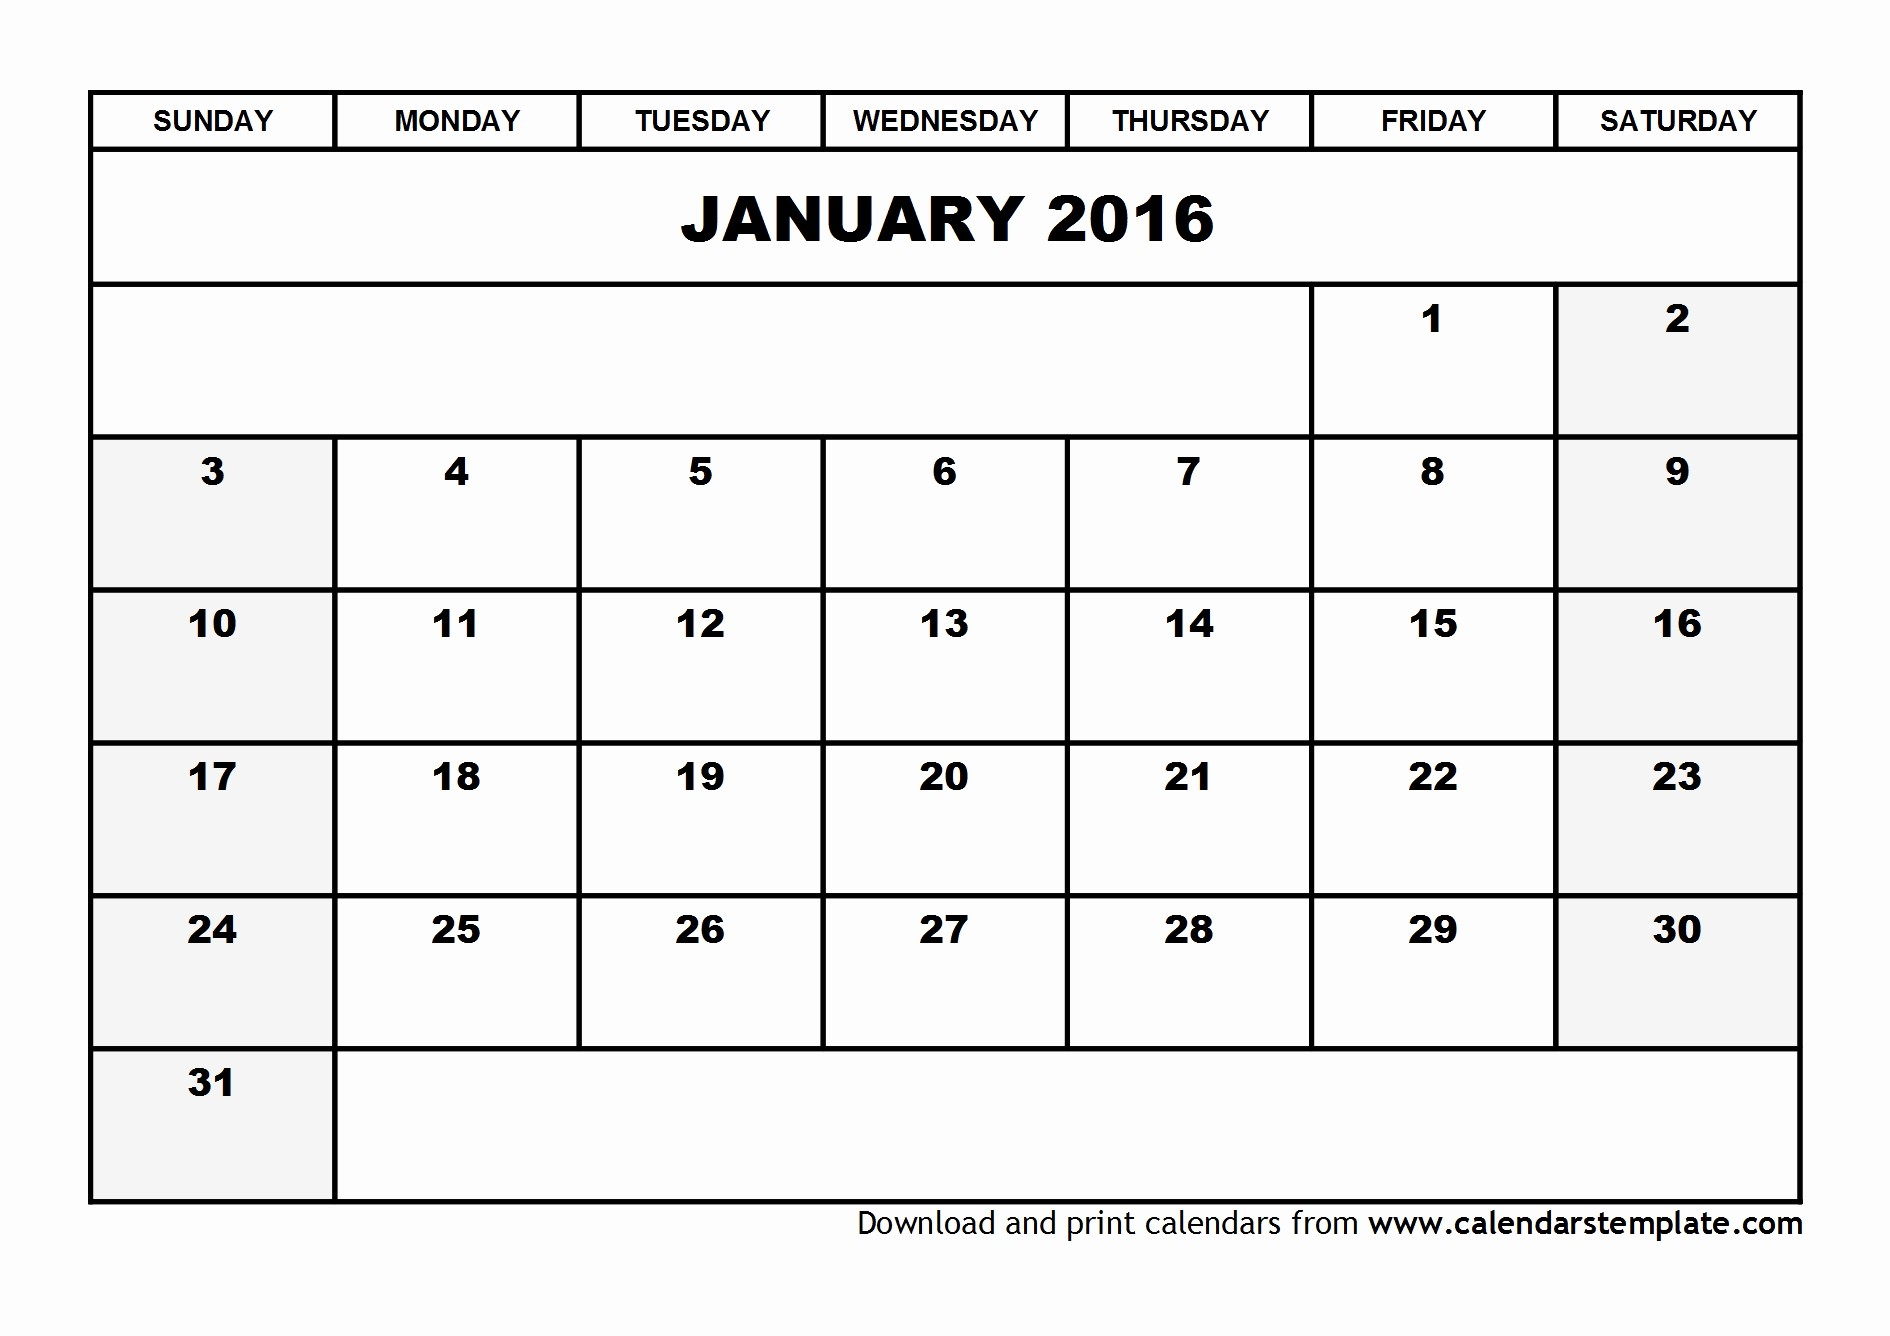 January 2016 Calendar Template Word Lovely 19 2016 Calendar Template January 2016 Printable